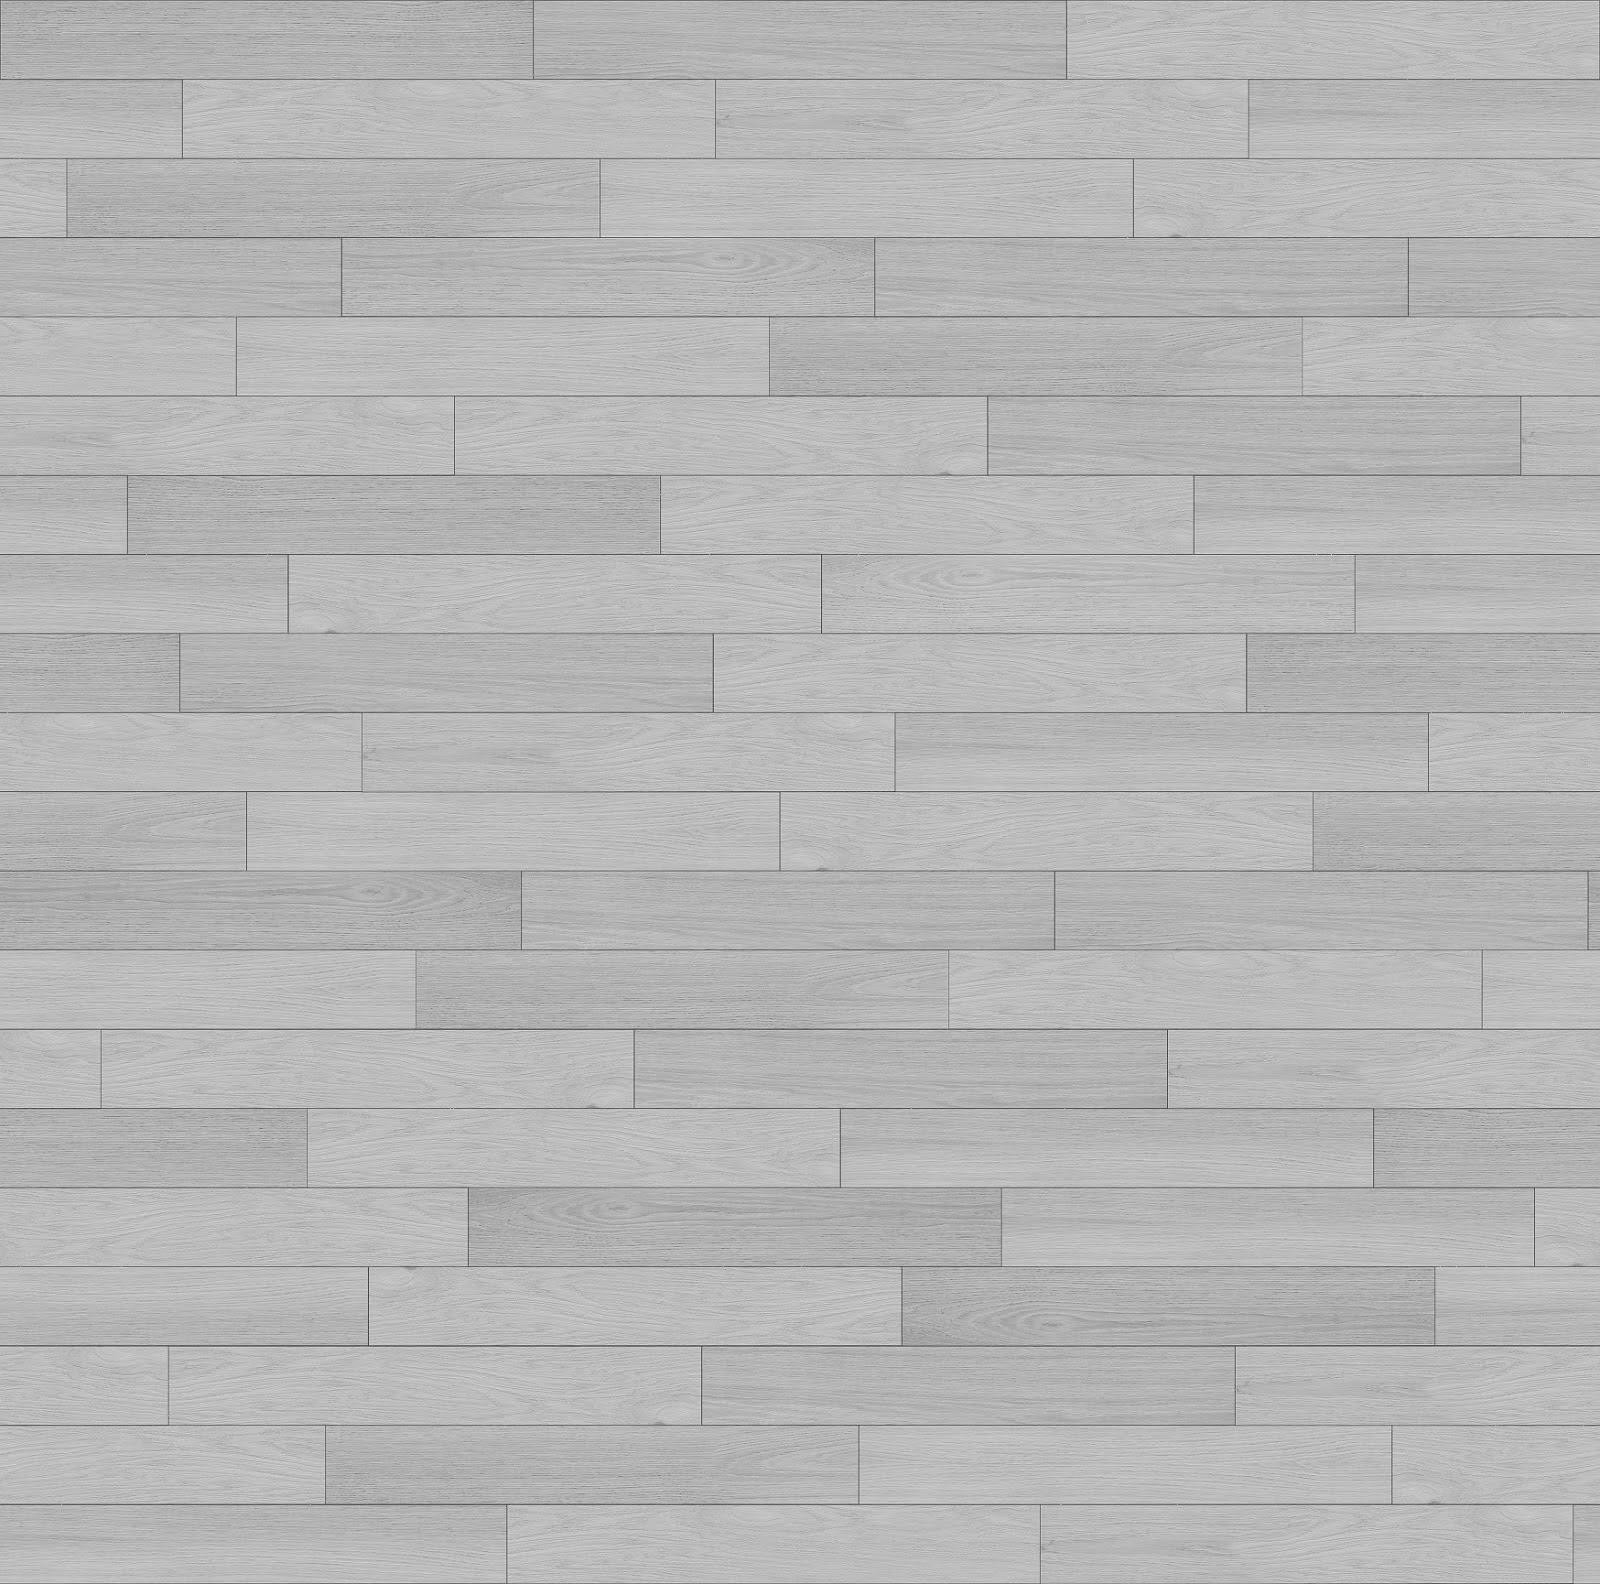 Texture free: Texture parquet